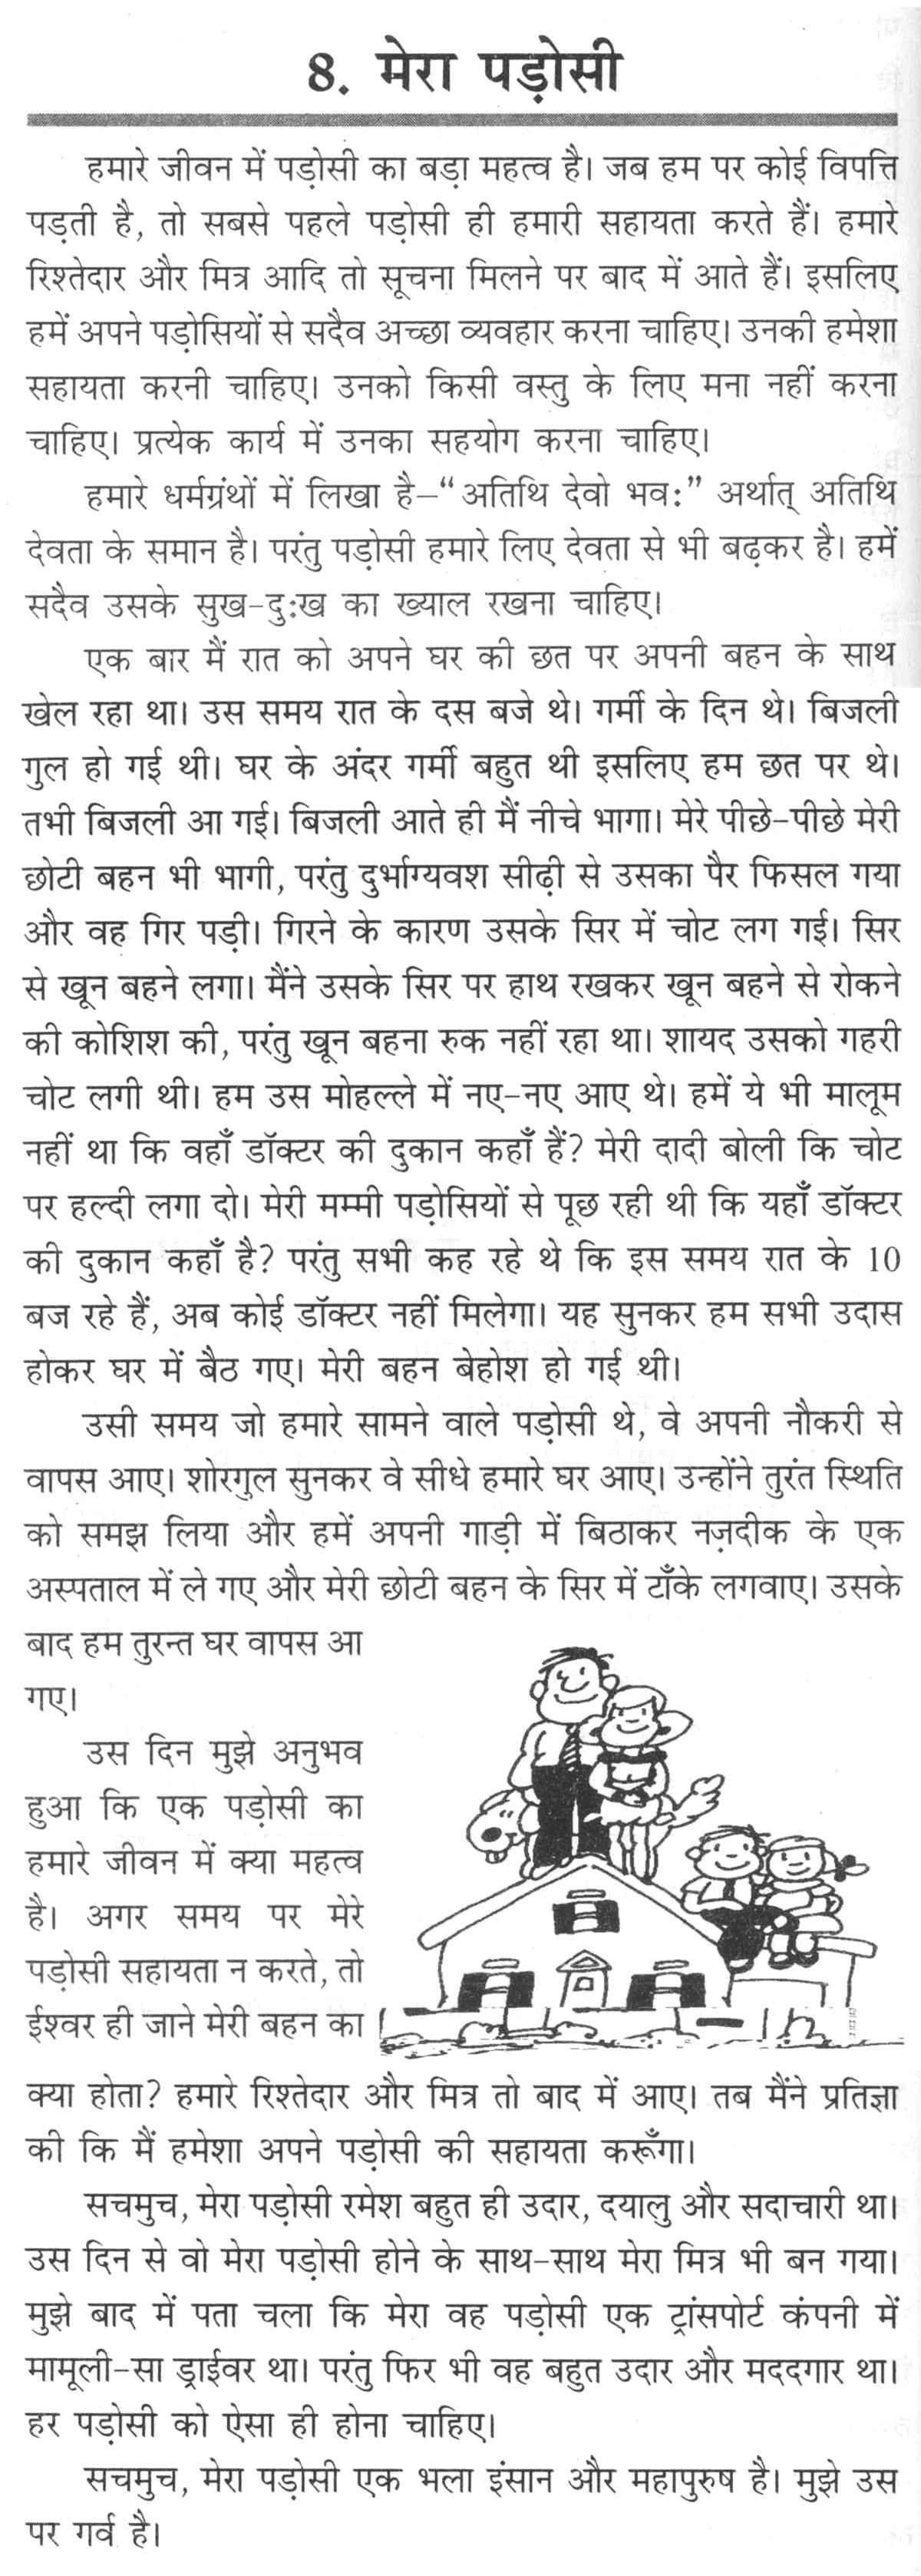 Essay On My Neighbor In Hindi